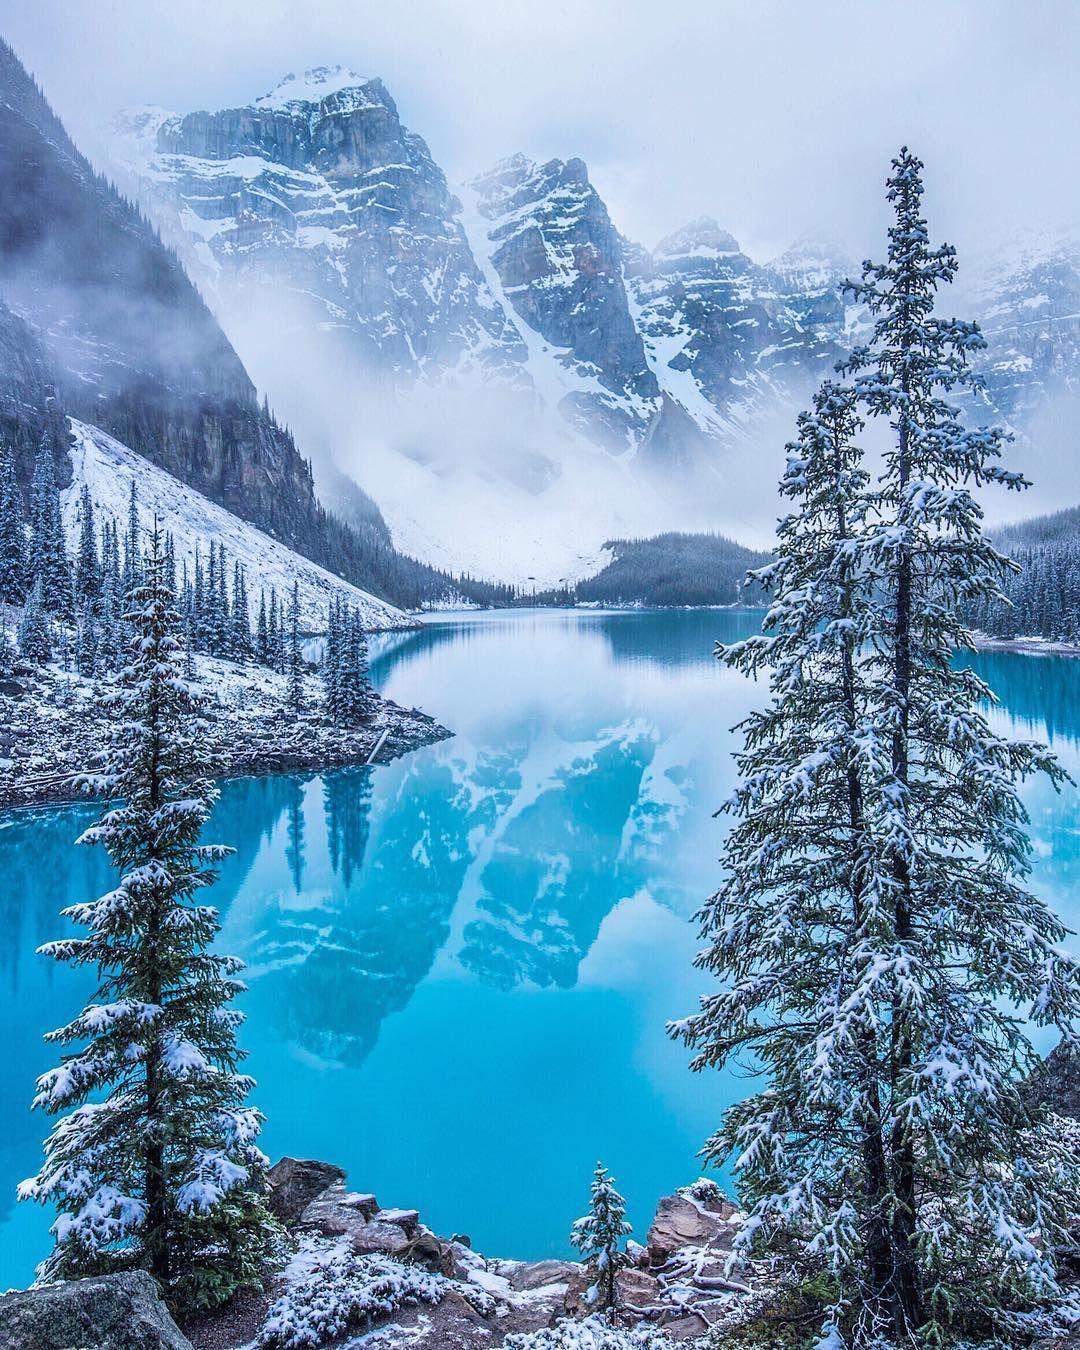 Winter Wonderland At Moraine Lake Banff National Park Alberta By Carmen Macleod 1080x1350 Https Ift Tt 2vvo22v Winter Scenery Nature Landscape Photos